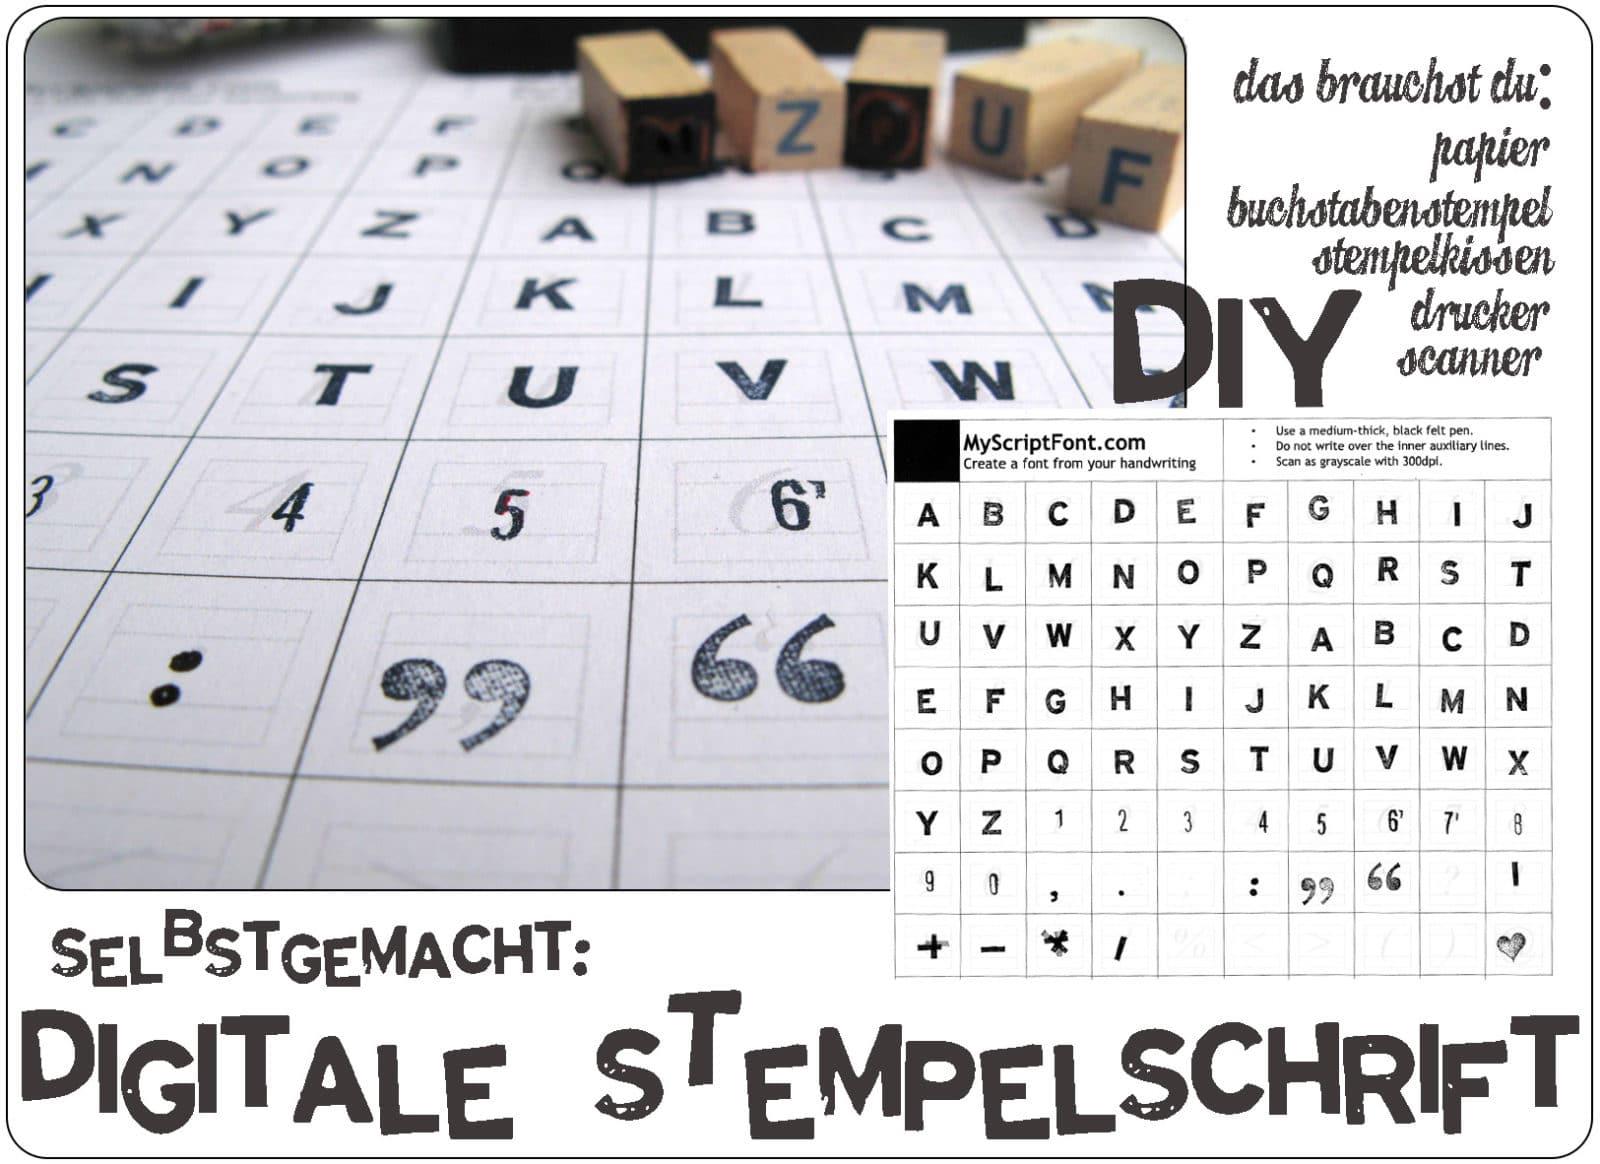 diy stempel schriftart selber machen handmade kultur. Black Bedroom Furniture Sets. Home Design Ideas